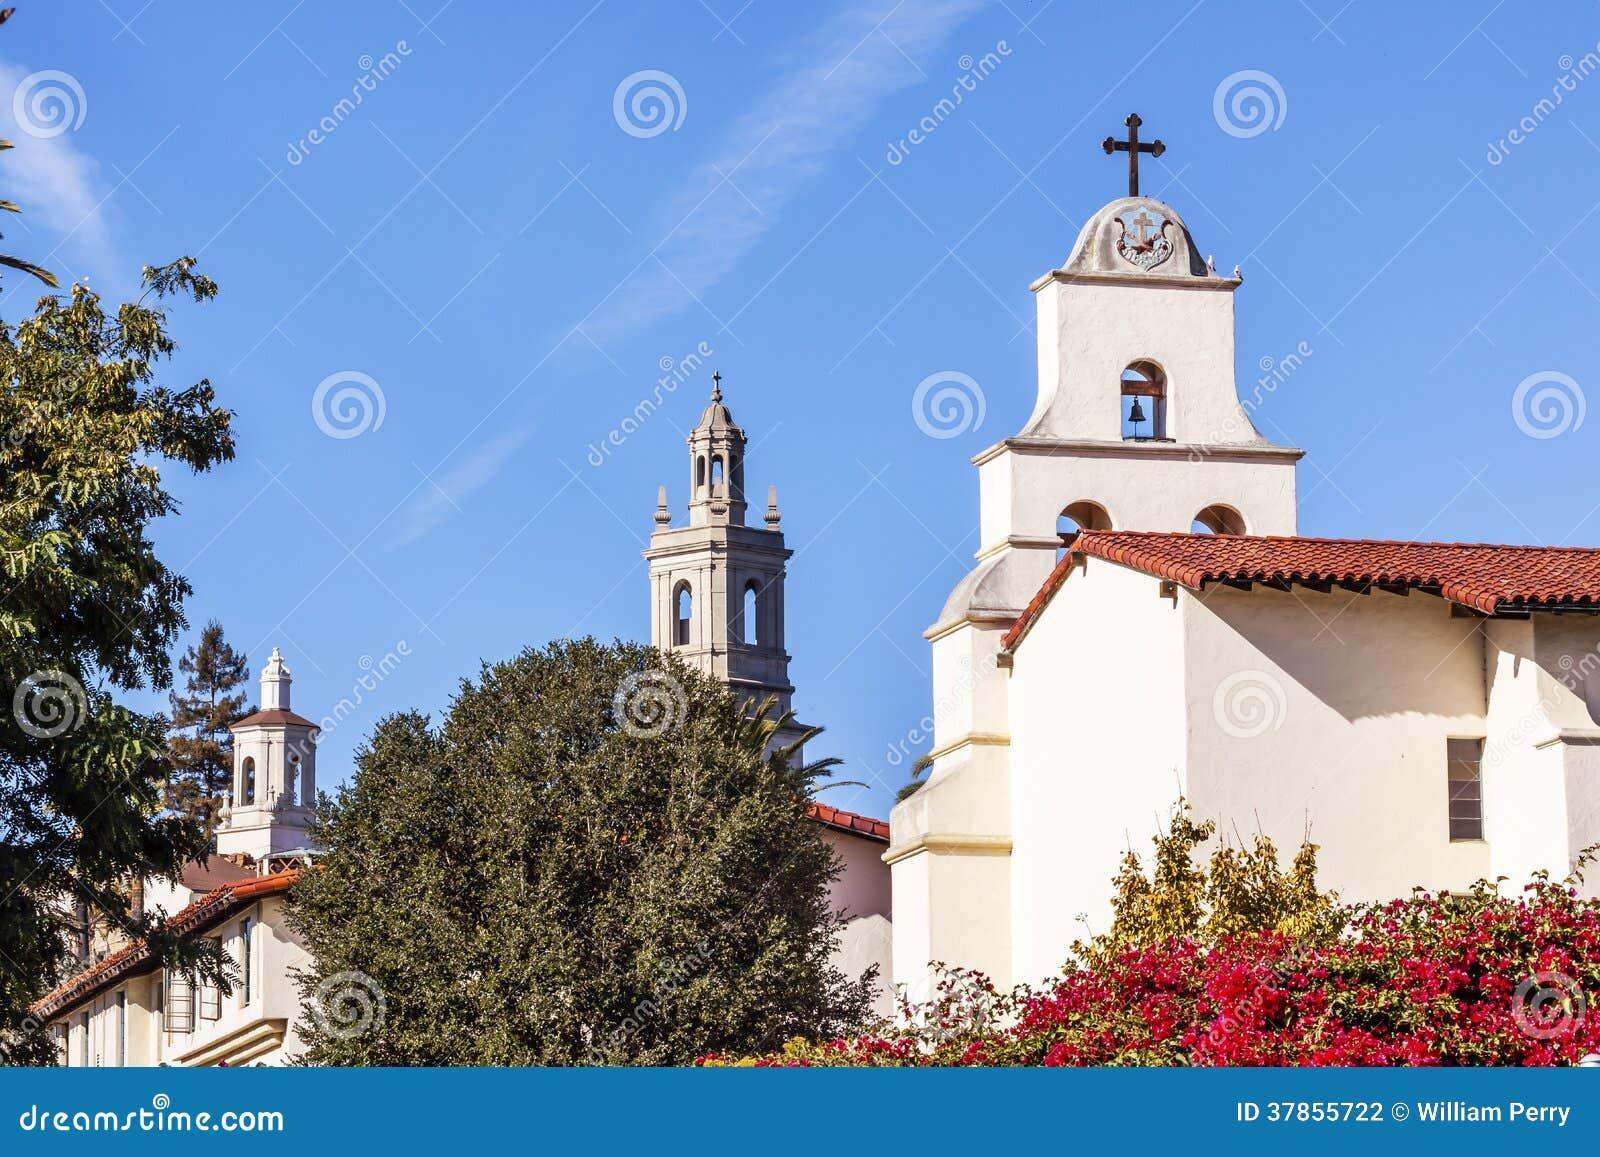 Download Steeples White Adobe Mission Santa Barbara Cross Bell California Stock Photo - Image of history, religion: 37855722